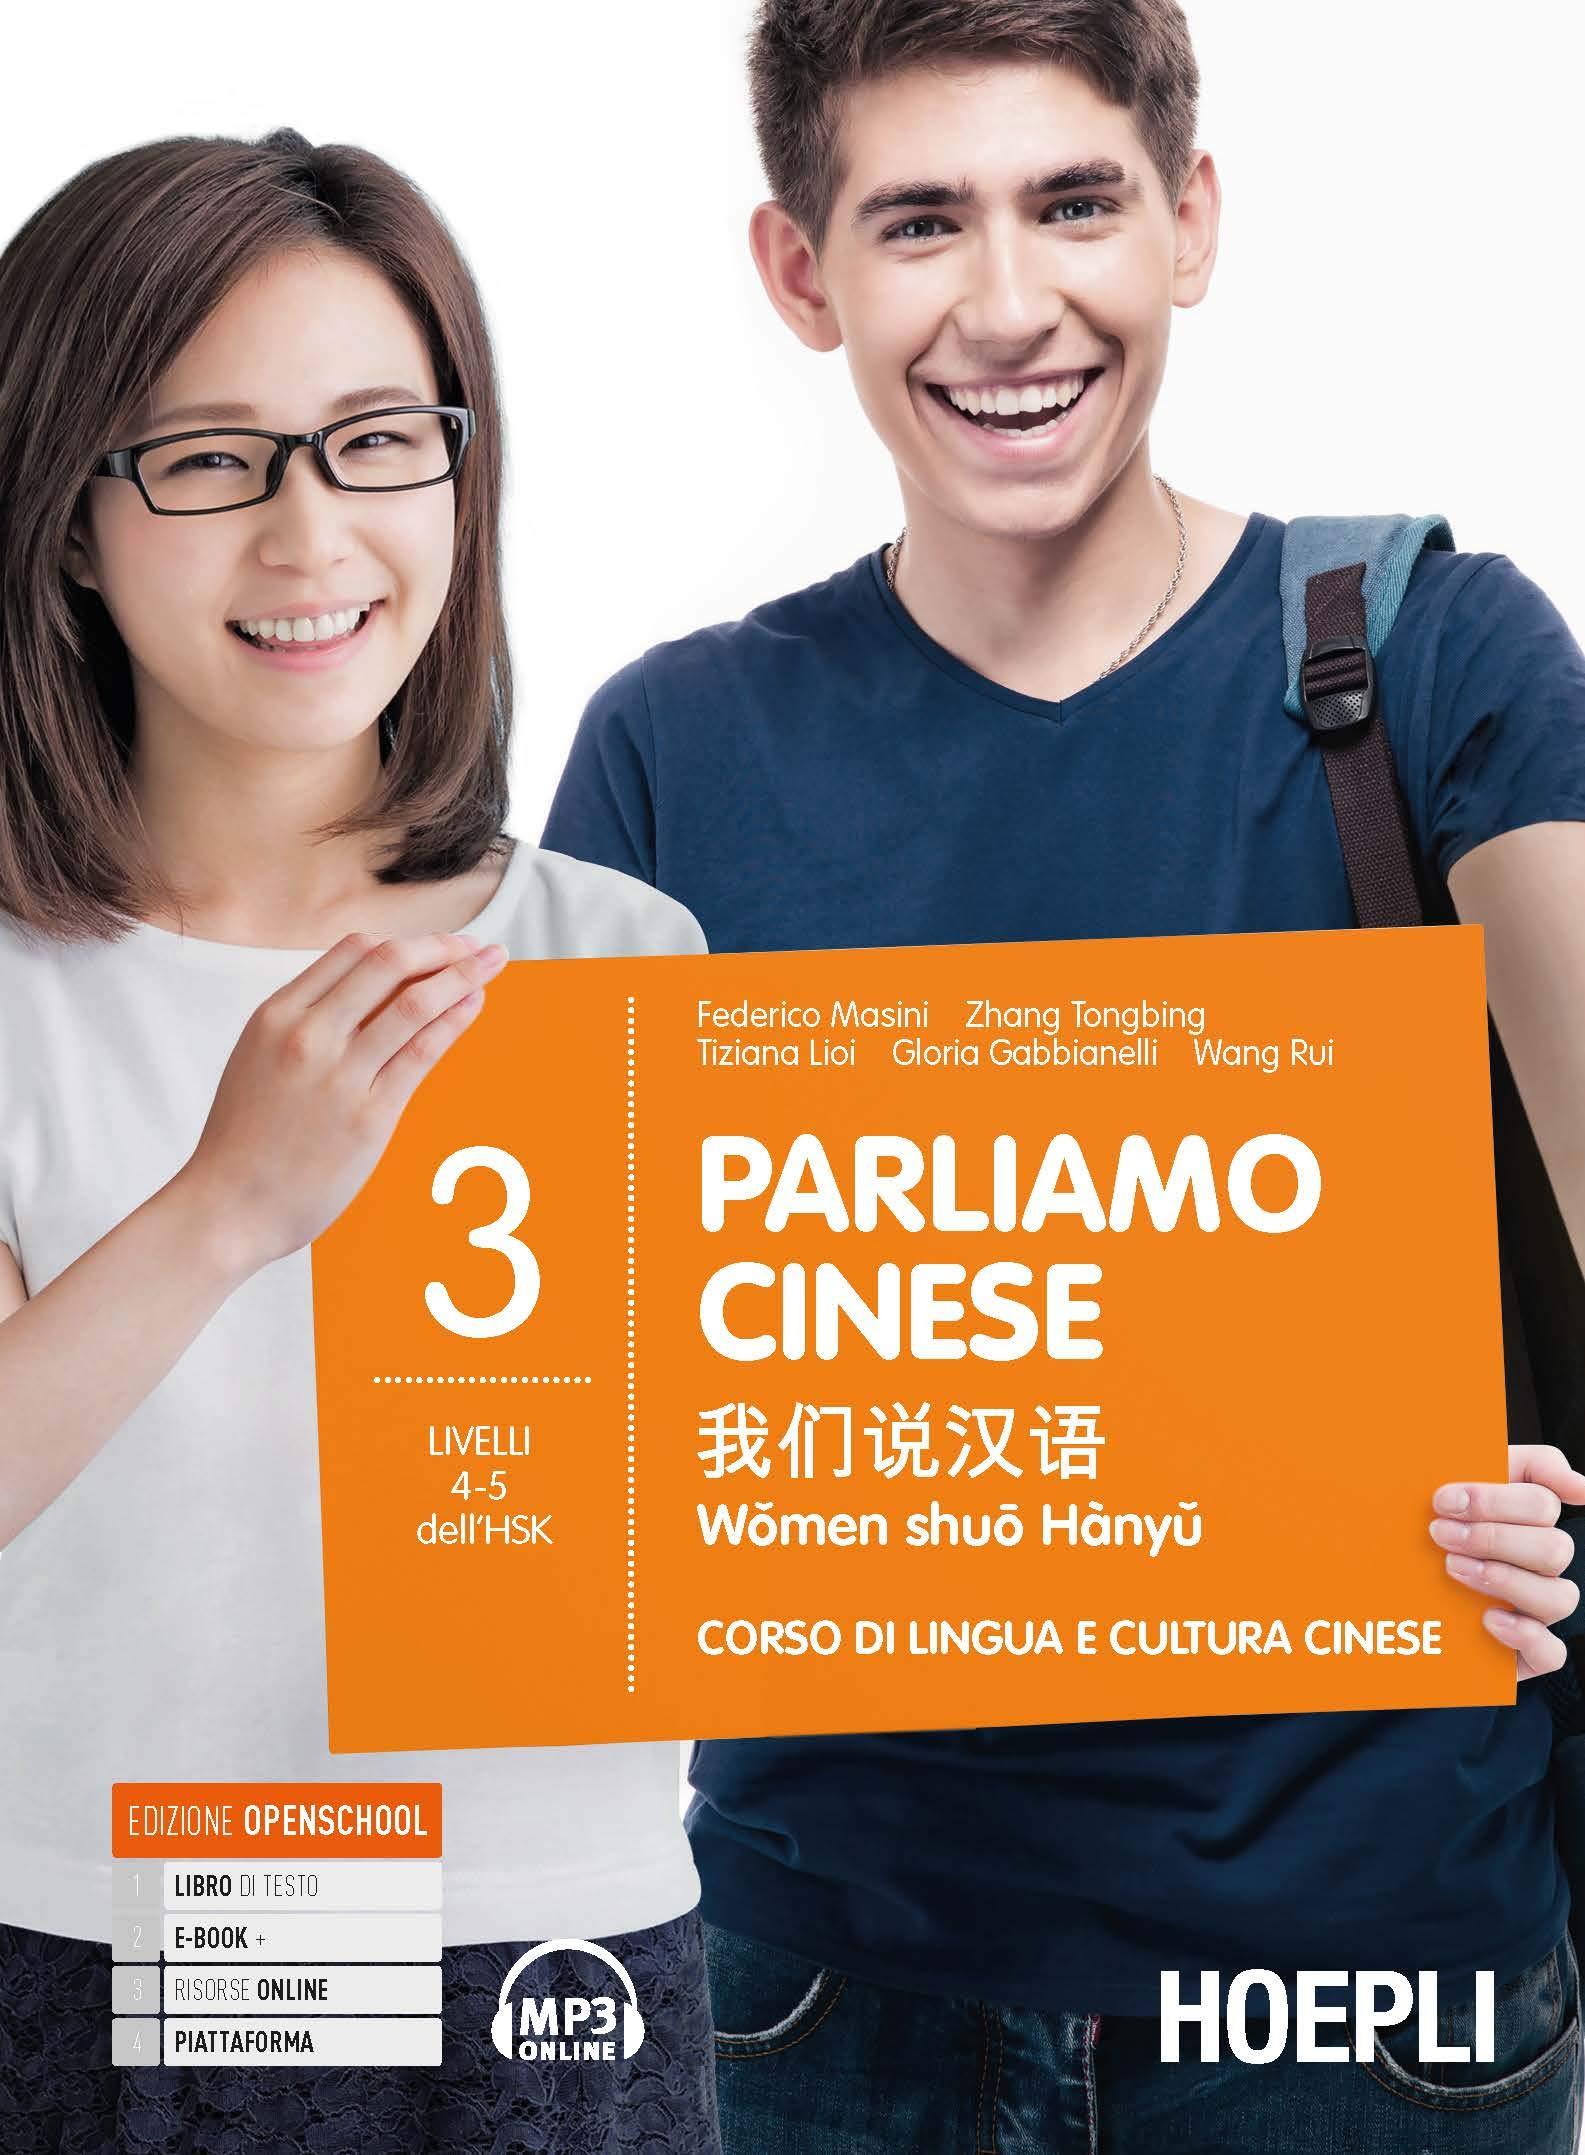 Parliamo cinese vol. 3